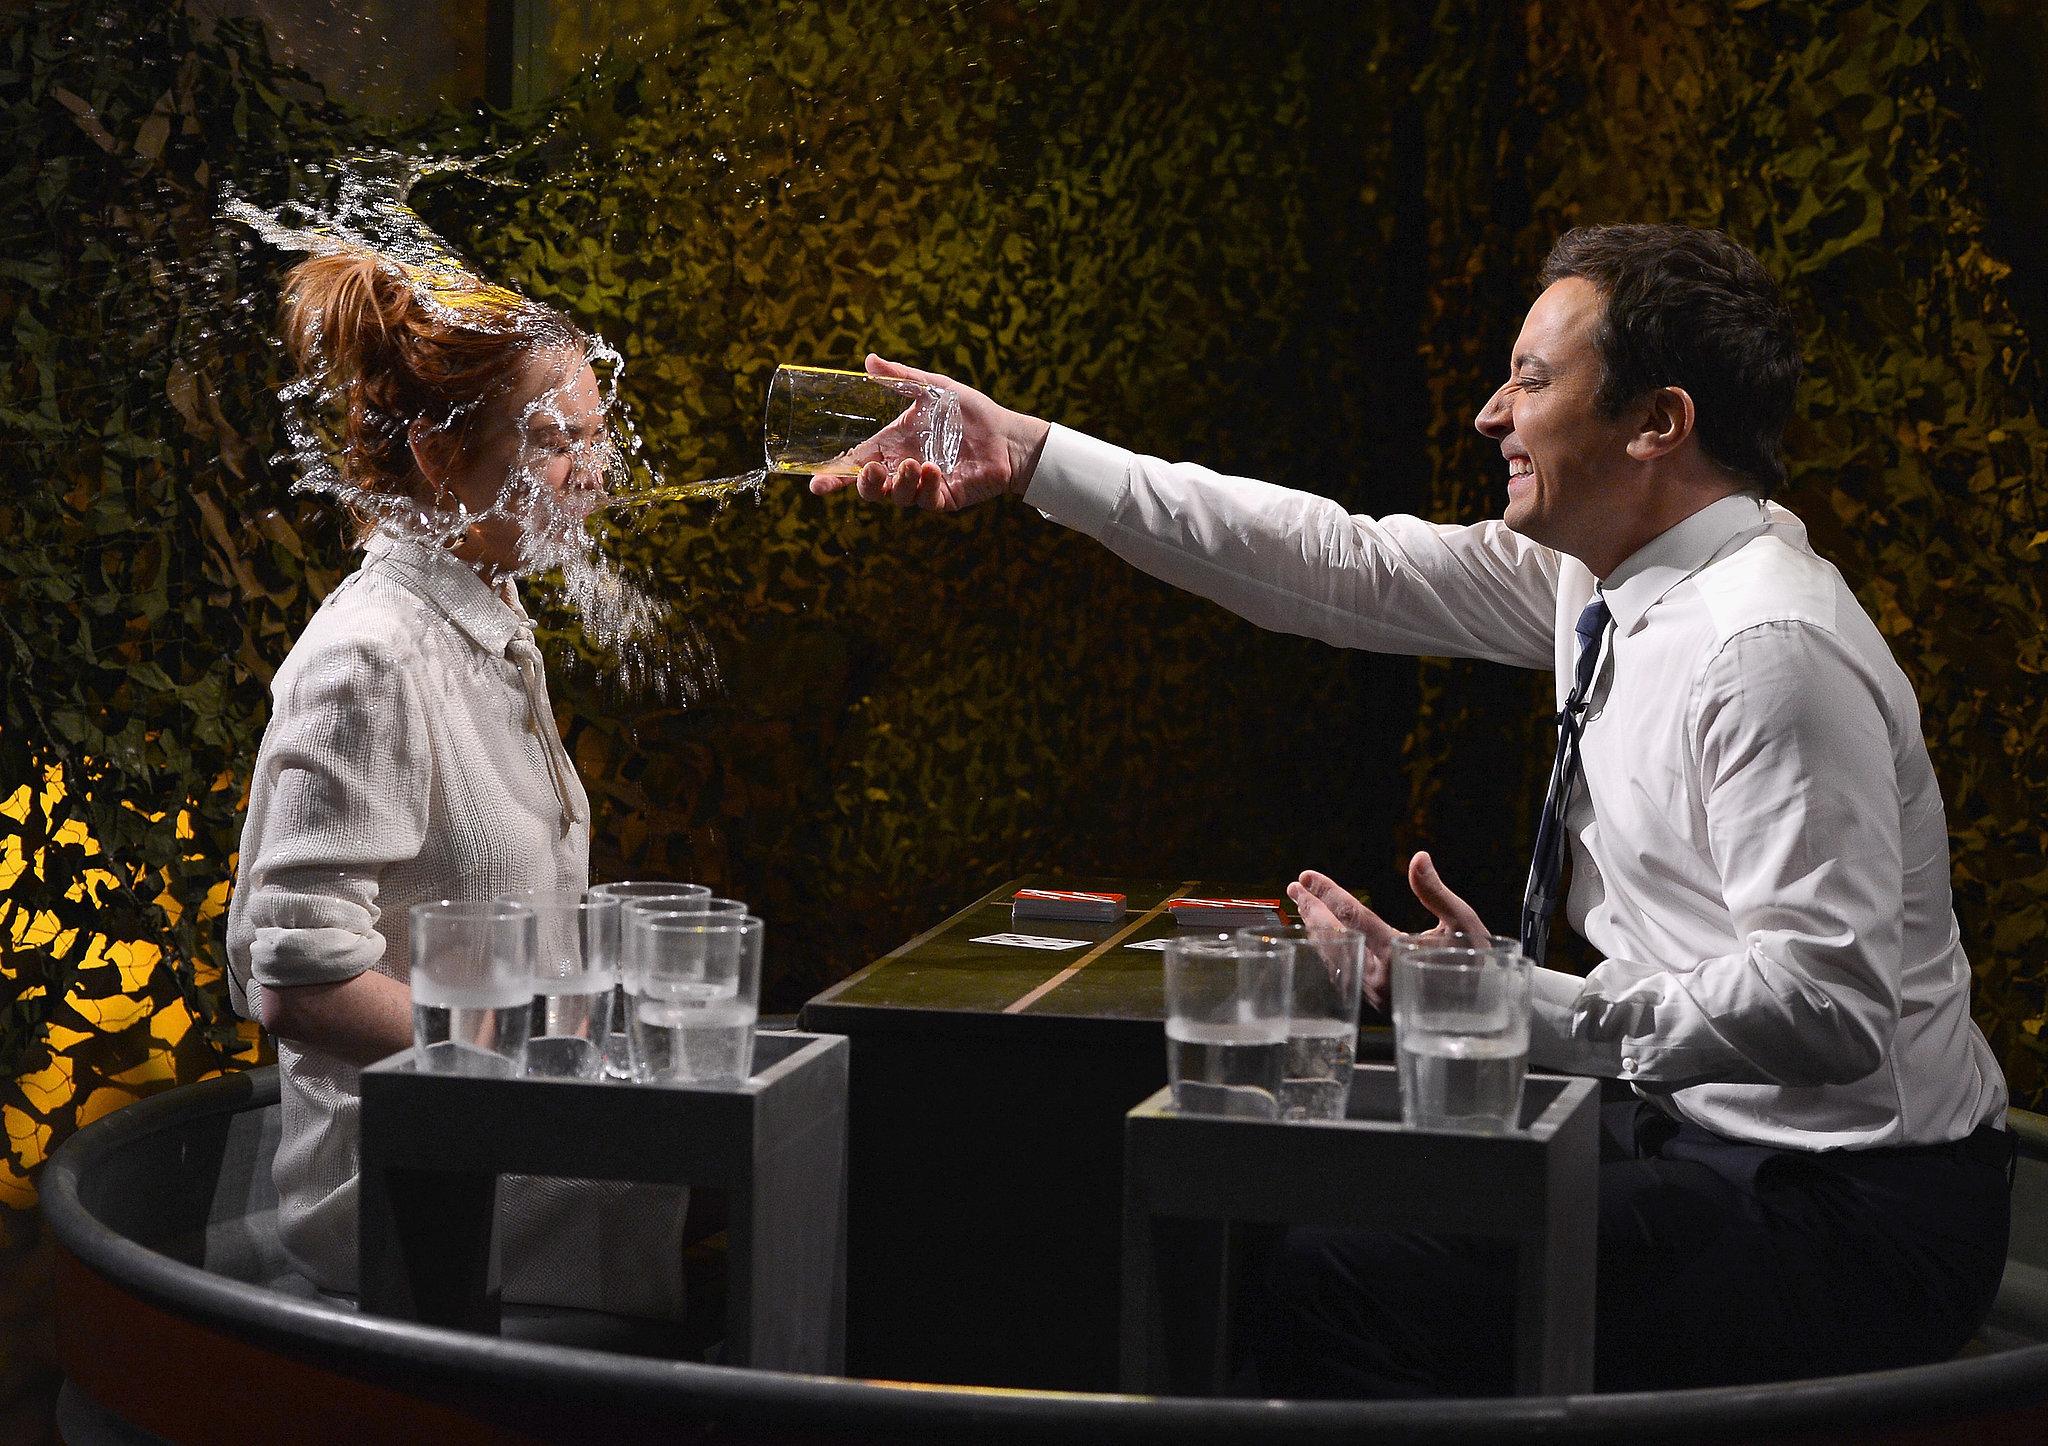 Fallon Tonight Show Show Starring Jimmy Fallon